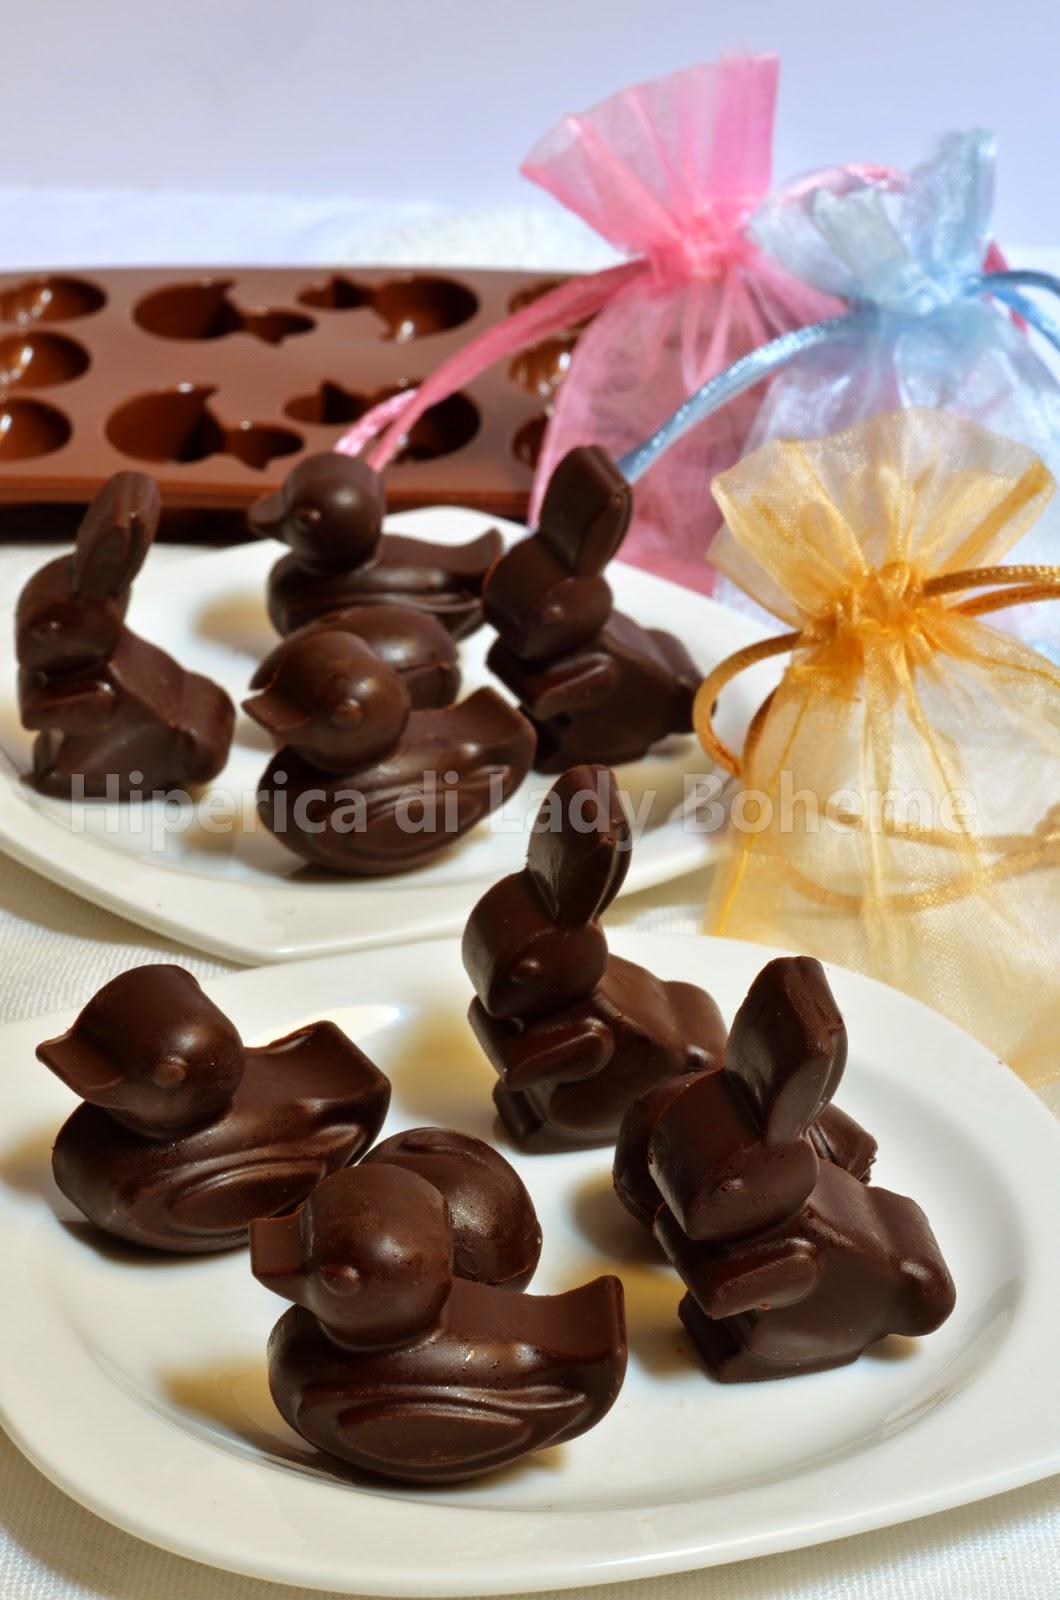 hiperica_lady_boheme_blog_cucina_ricette_gustose_facili_veloci_cioccolatini_pasquali_2